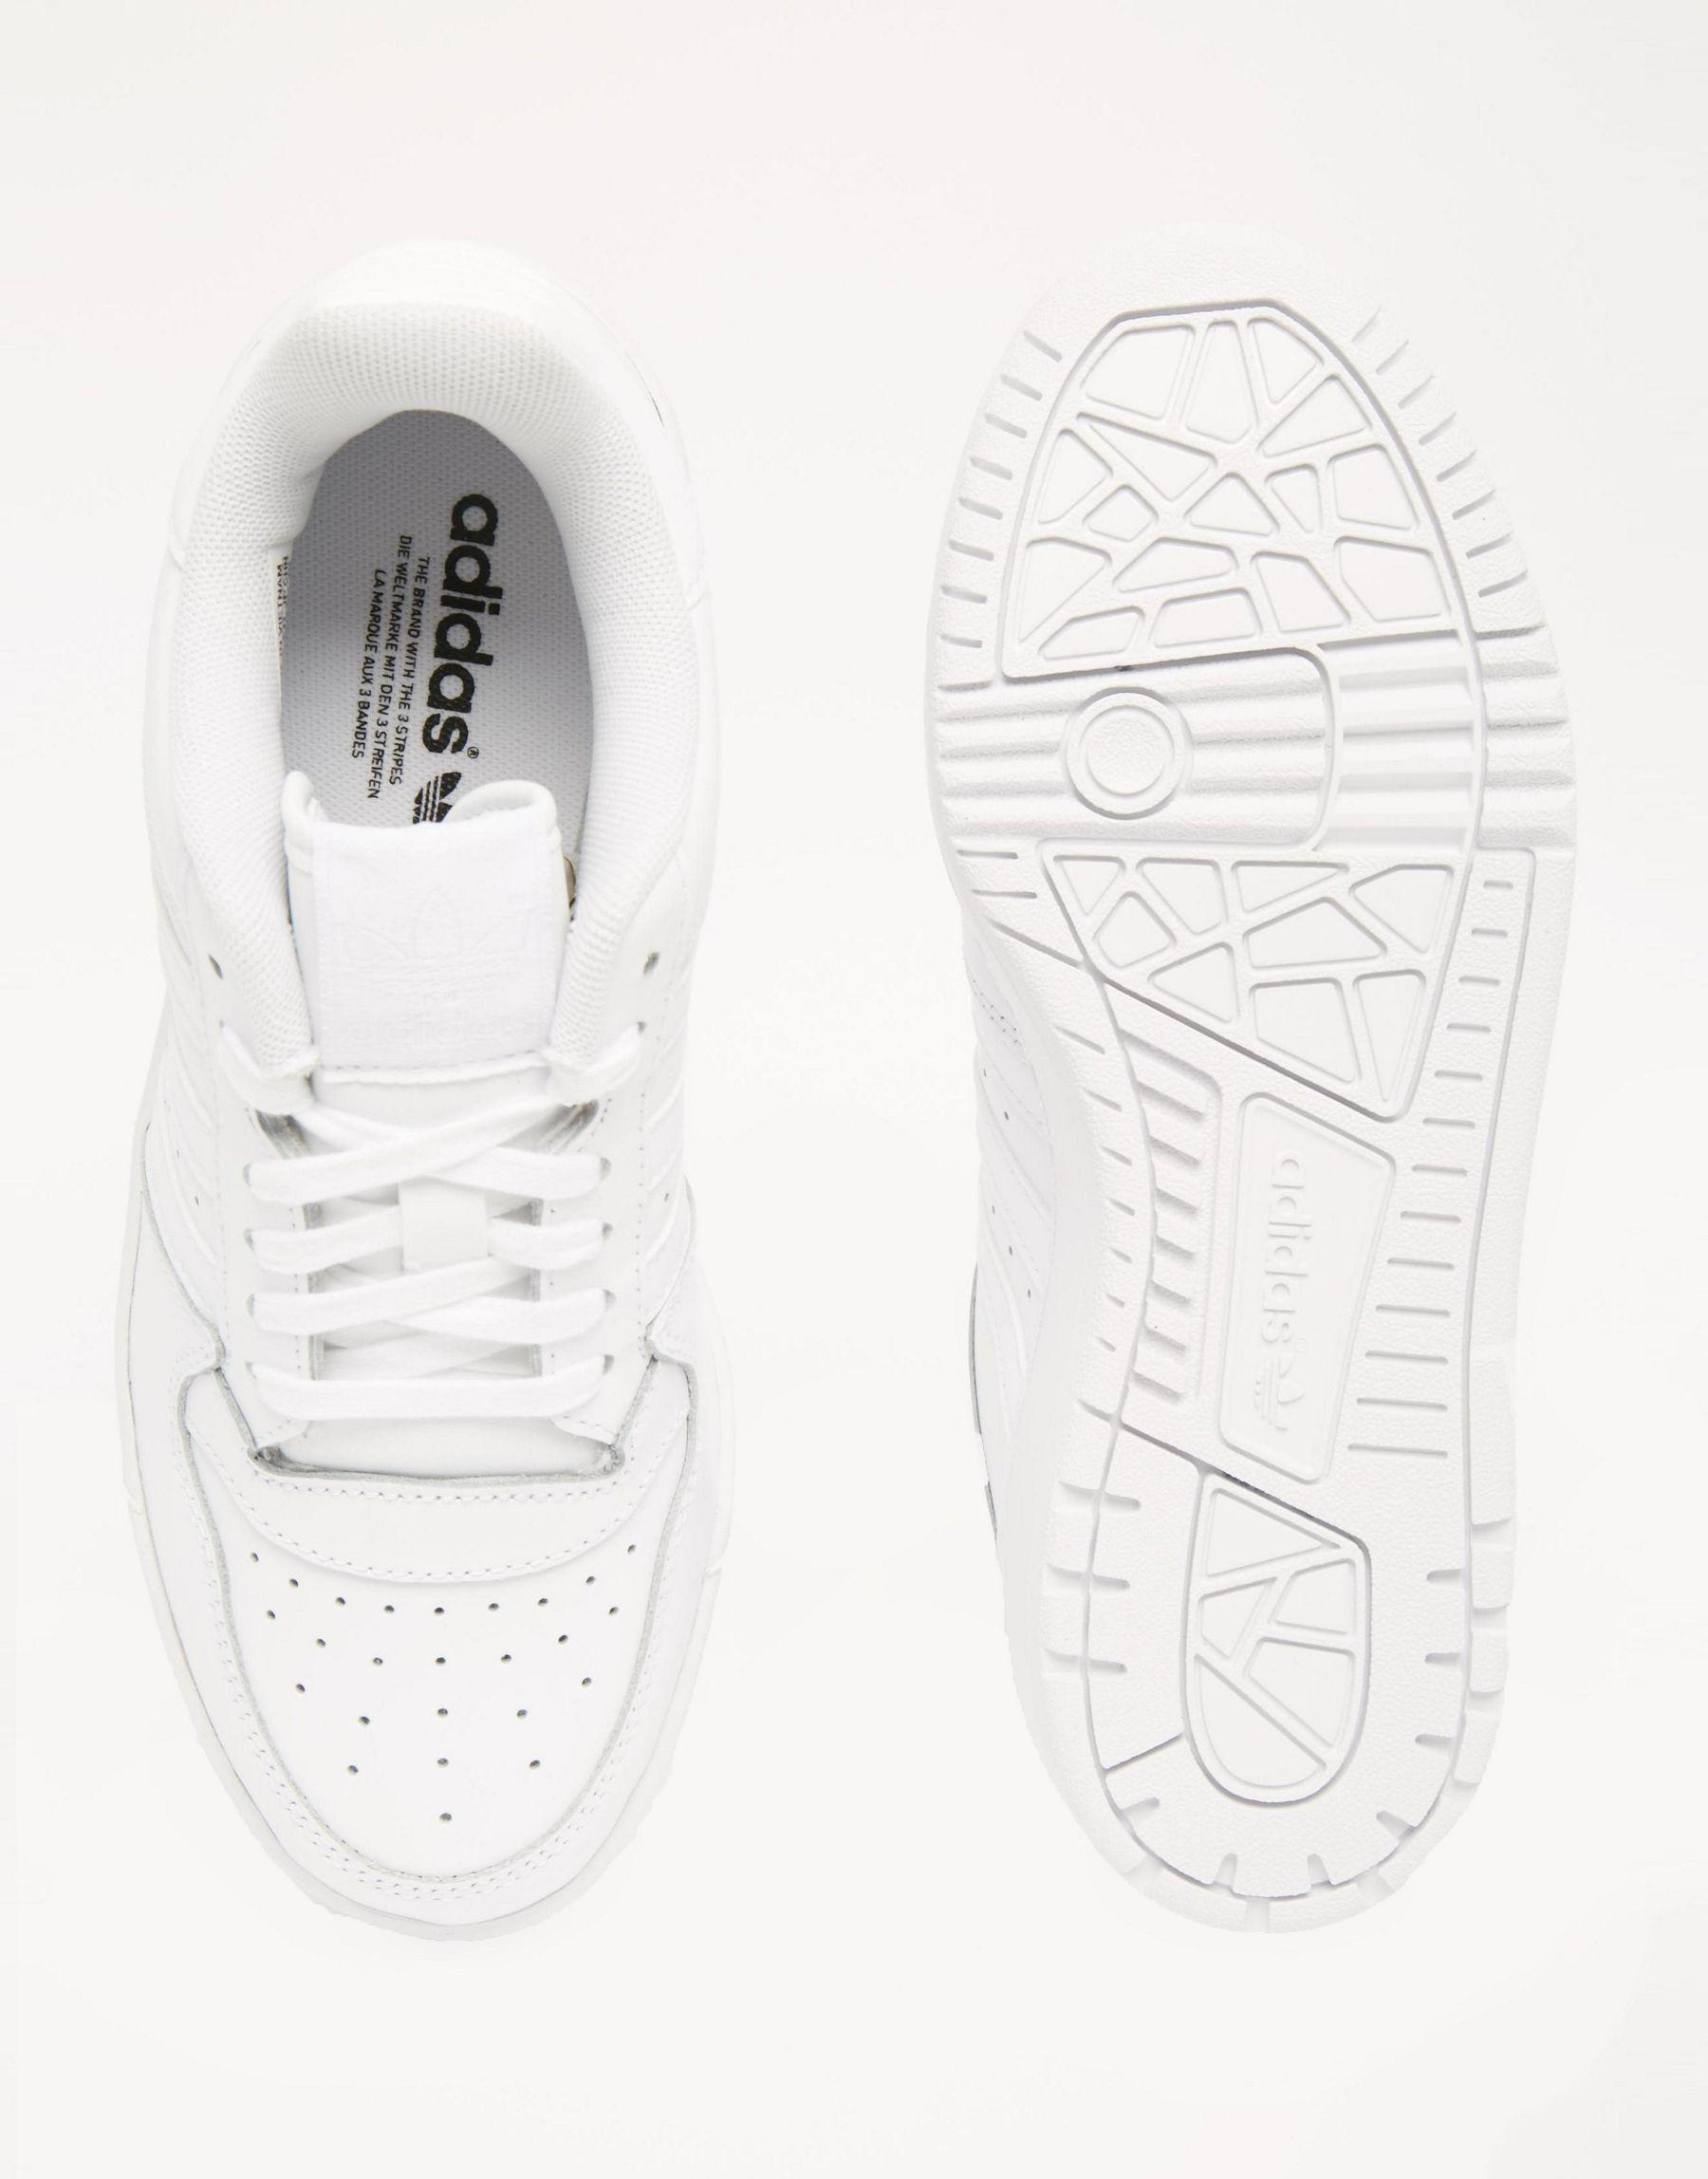 Lyst - adidas Originals Orginals White Leather Attitude Revive Trainers in  White ea5f8d1326c5f